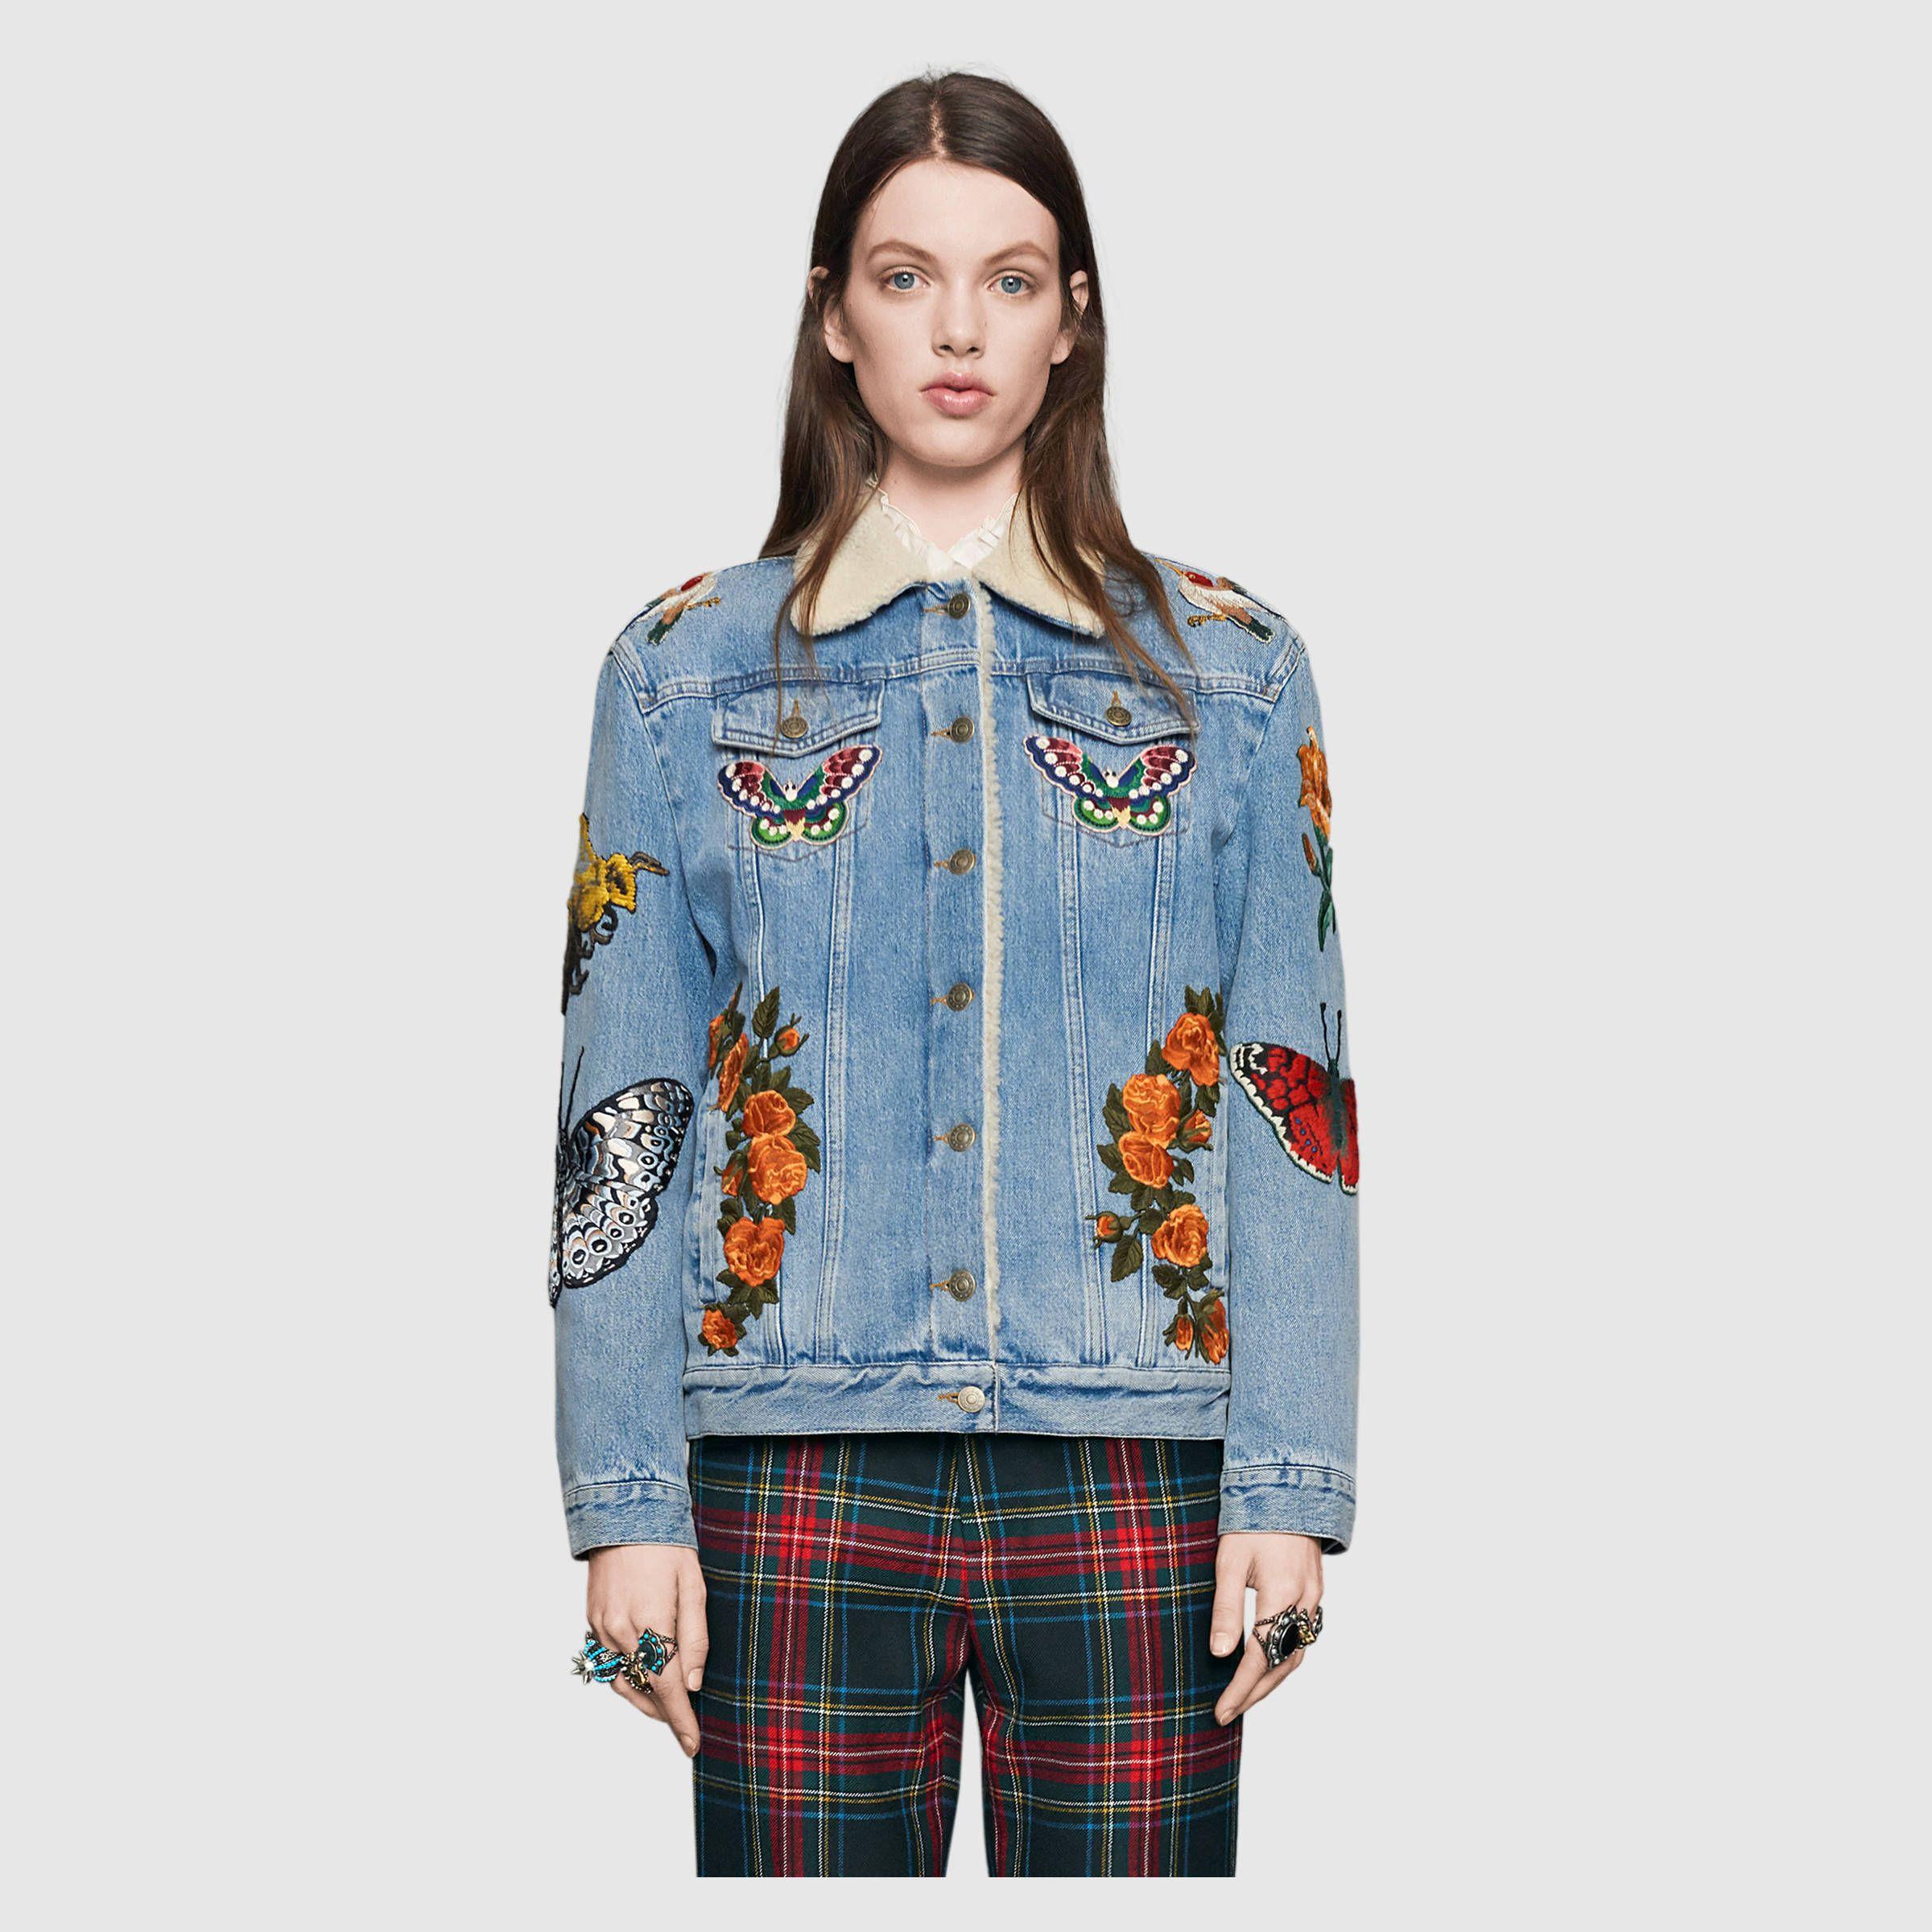 LRT Womens Denim Jacket Embroidered Floral Jean Jacket (XS, Blue)